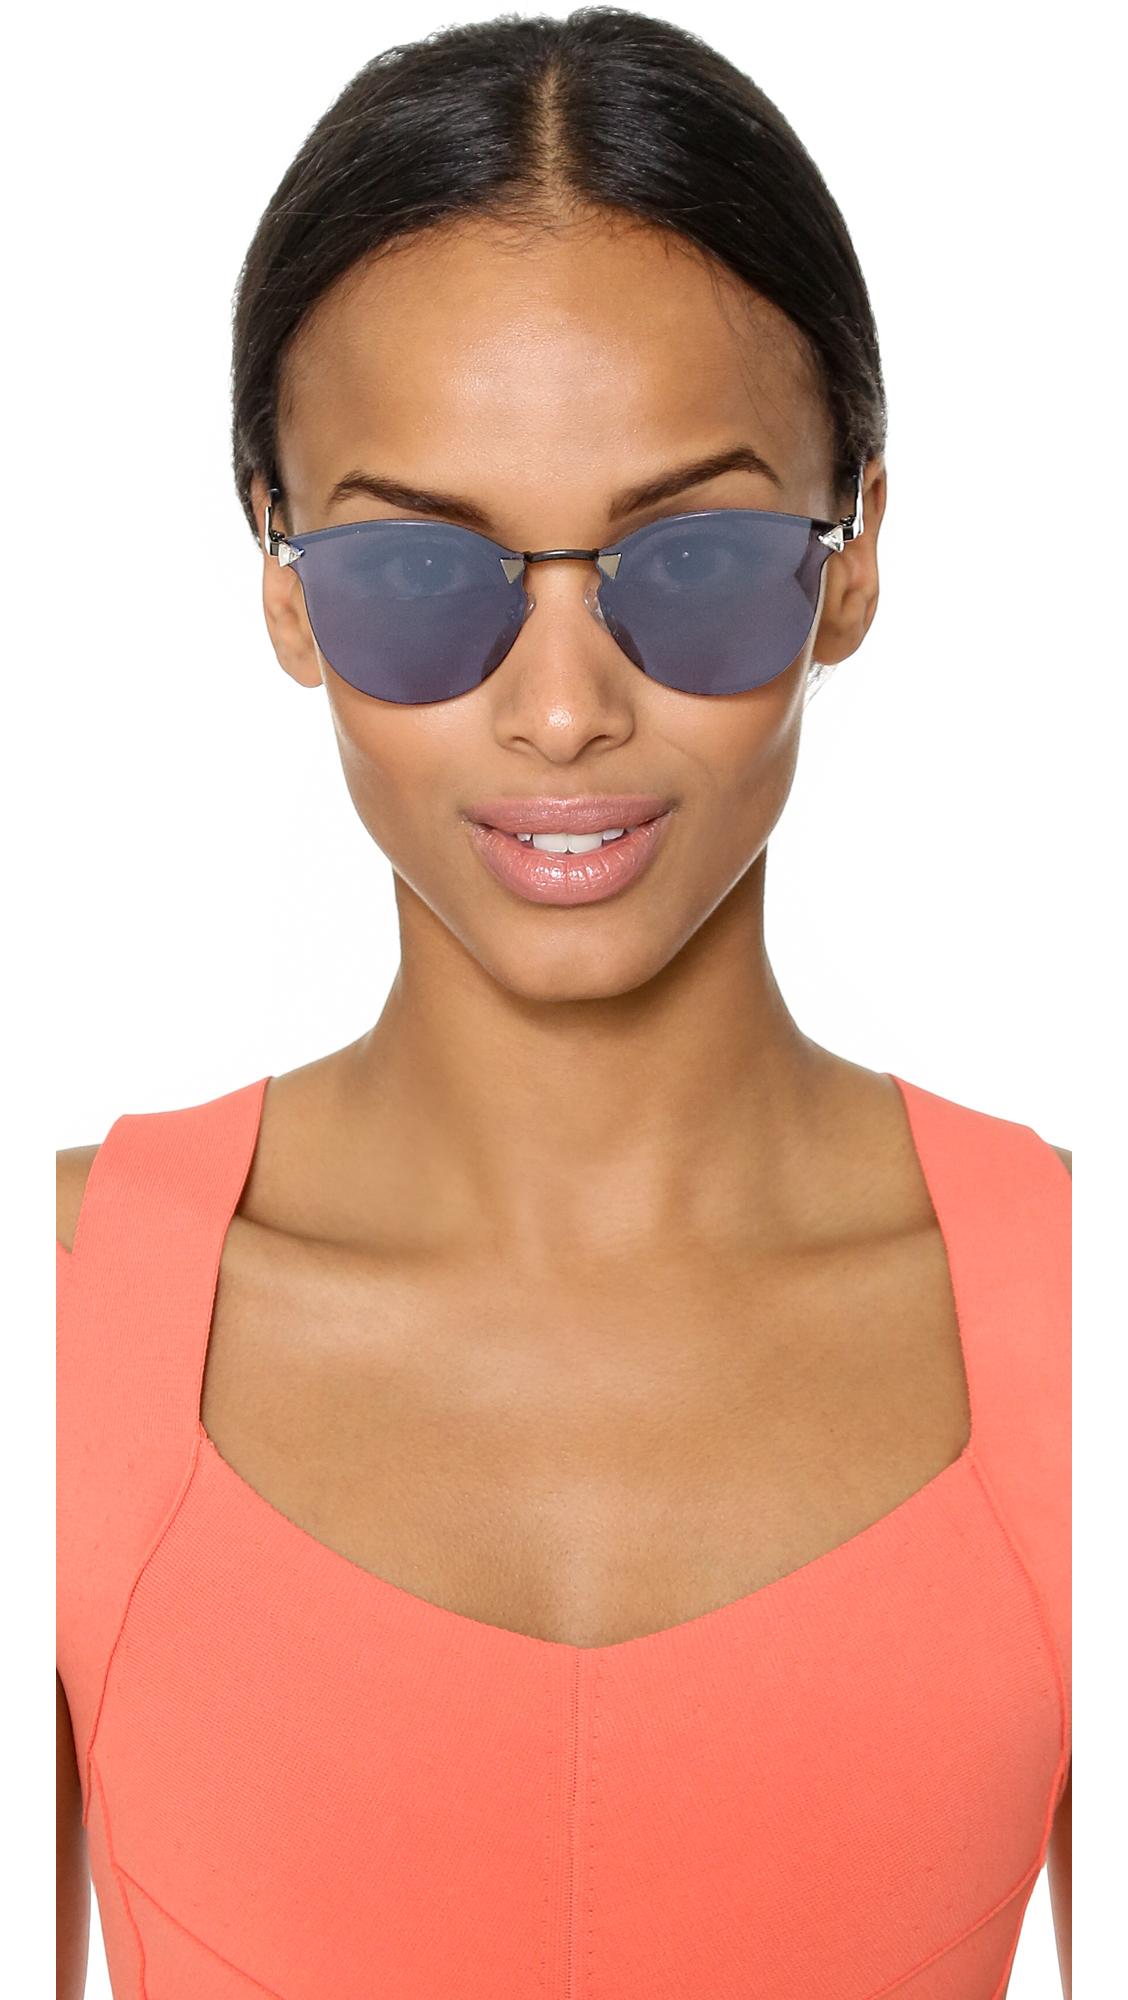 896659f9cc4 Fendi Iridia Rimless Bottom Sunglasses